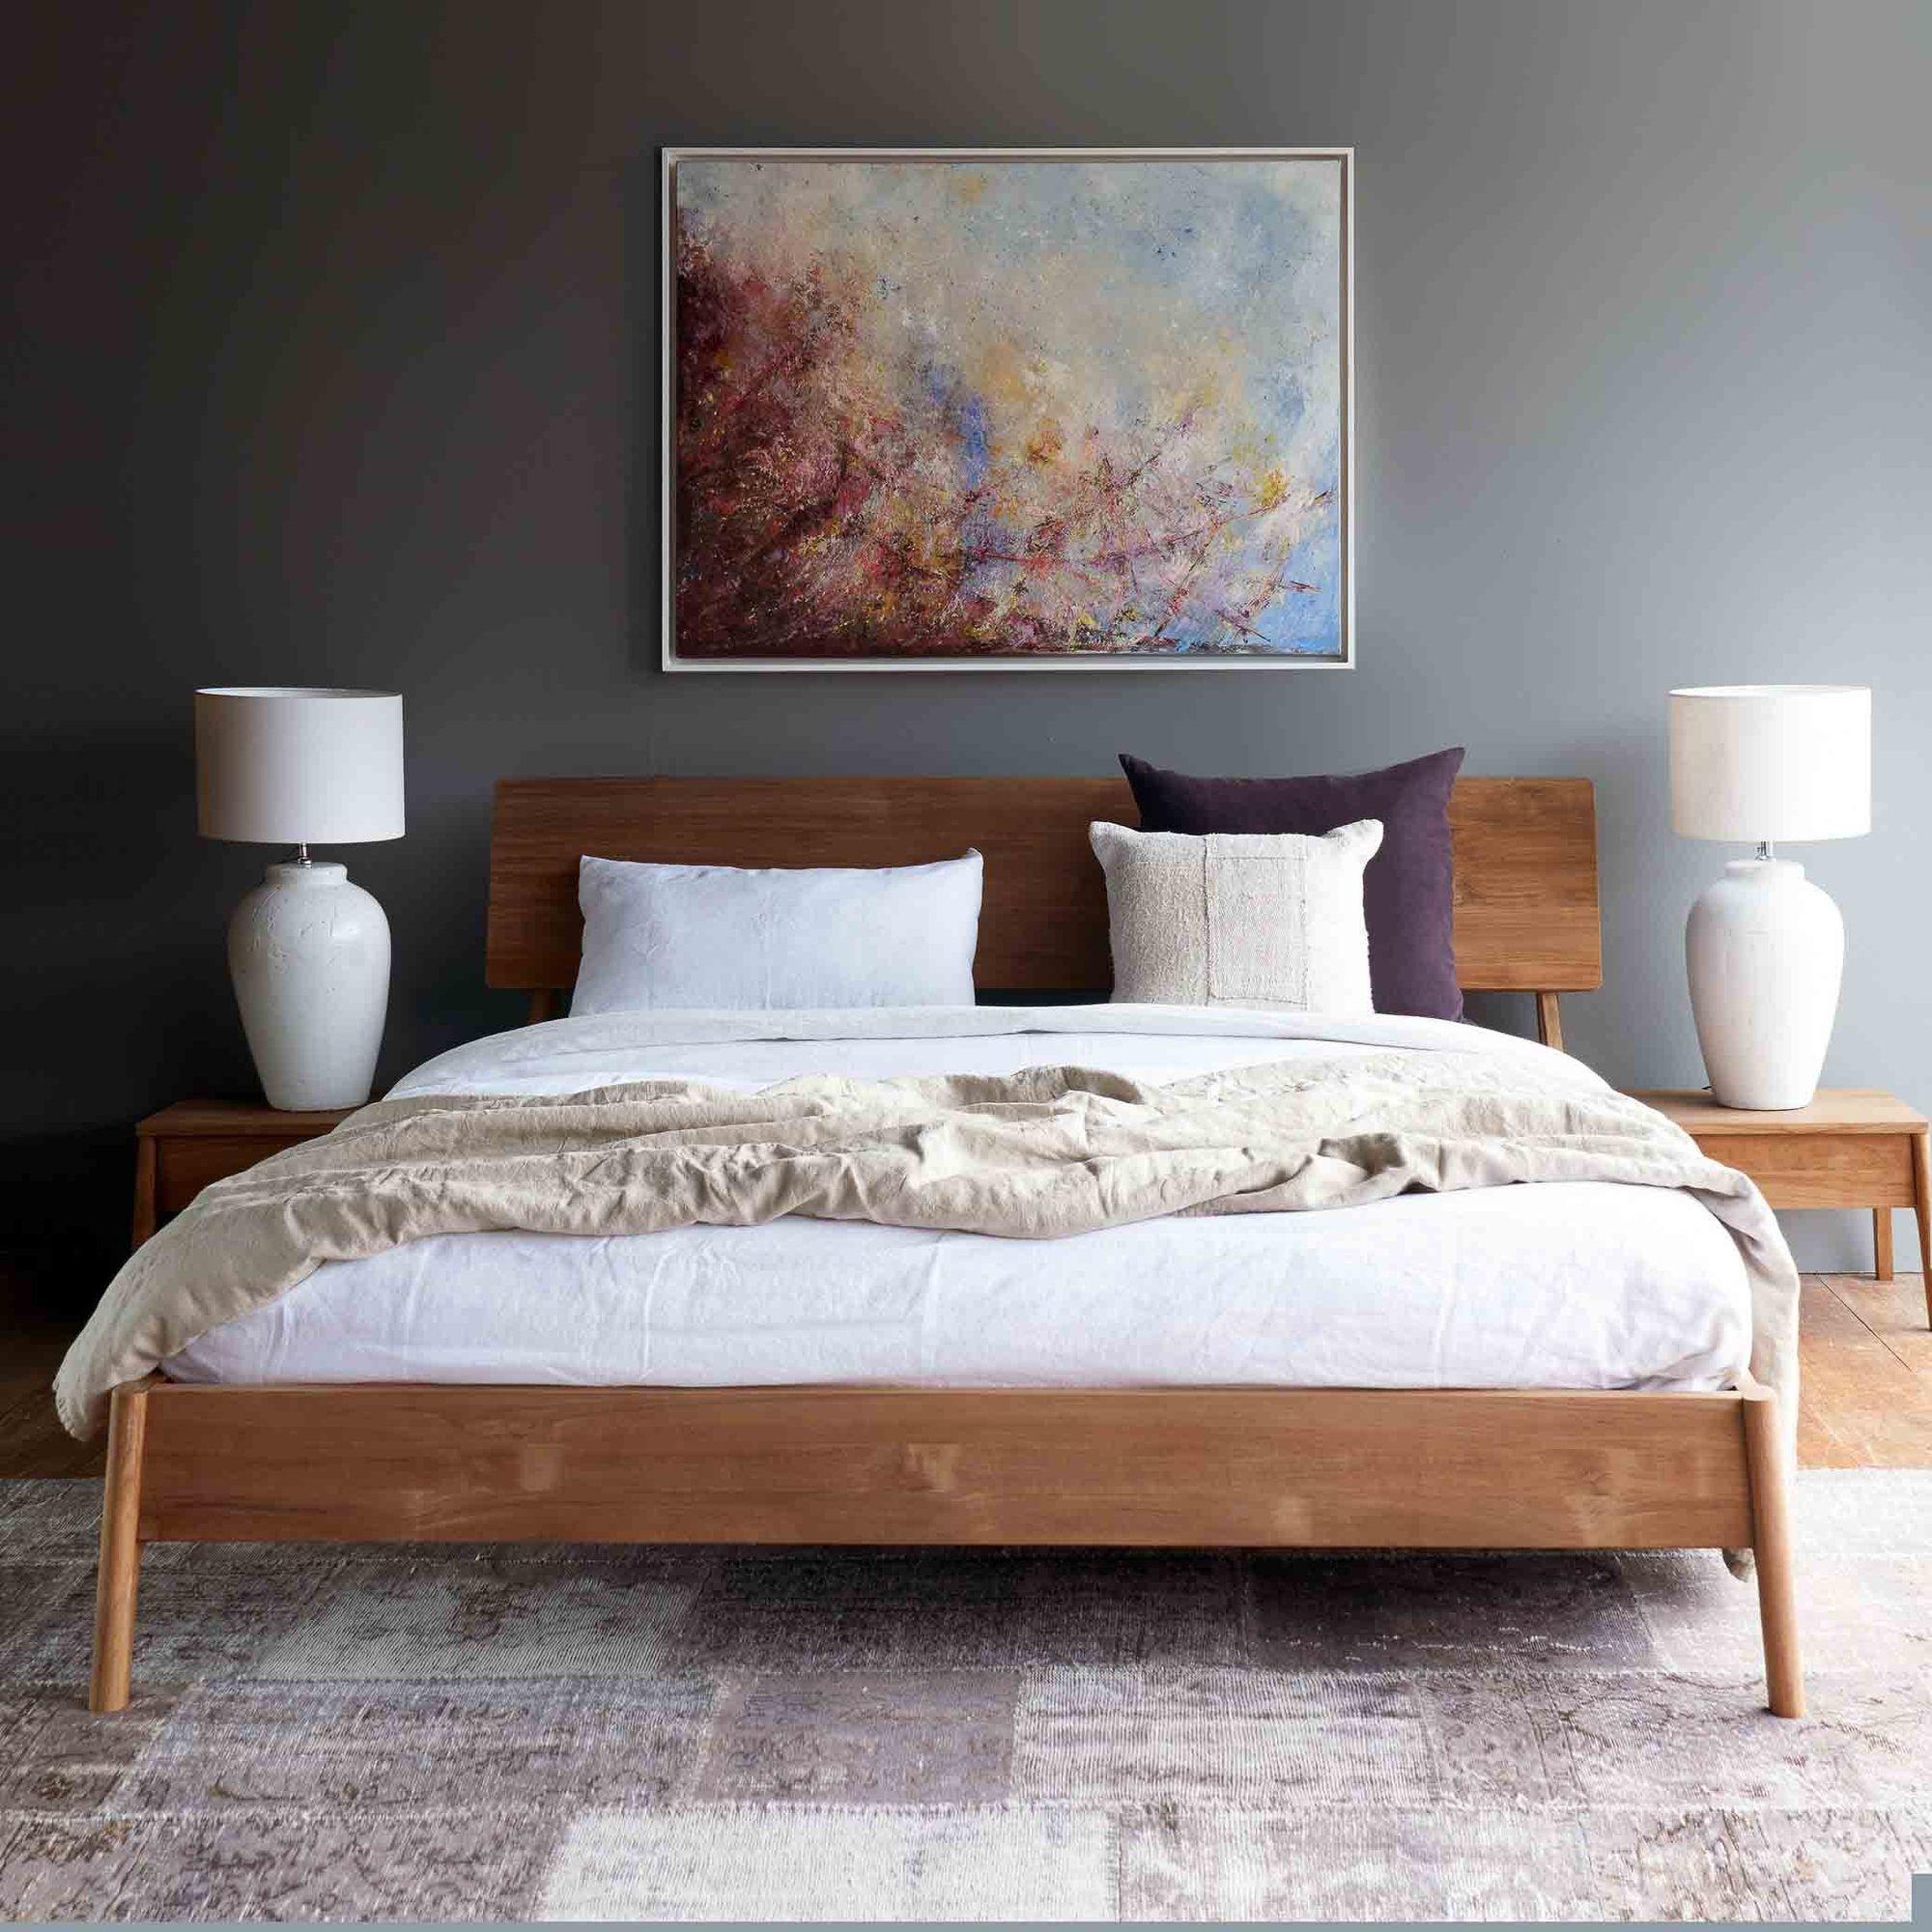 Teak Bed Frame Air Bed Australia Size in 2020 Bed